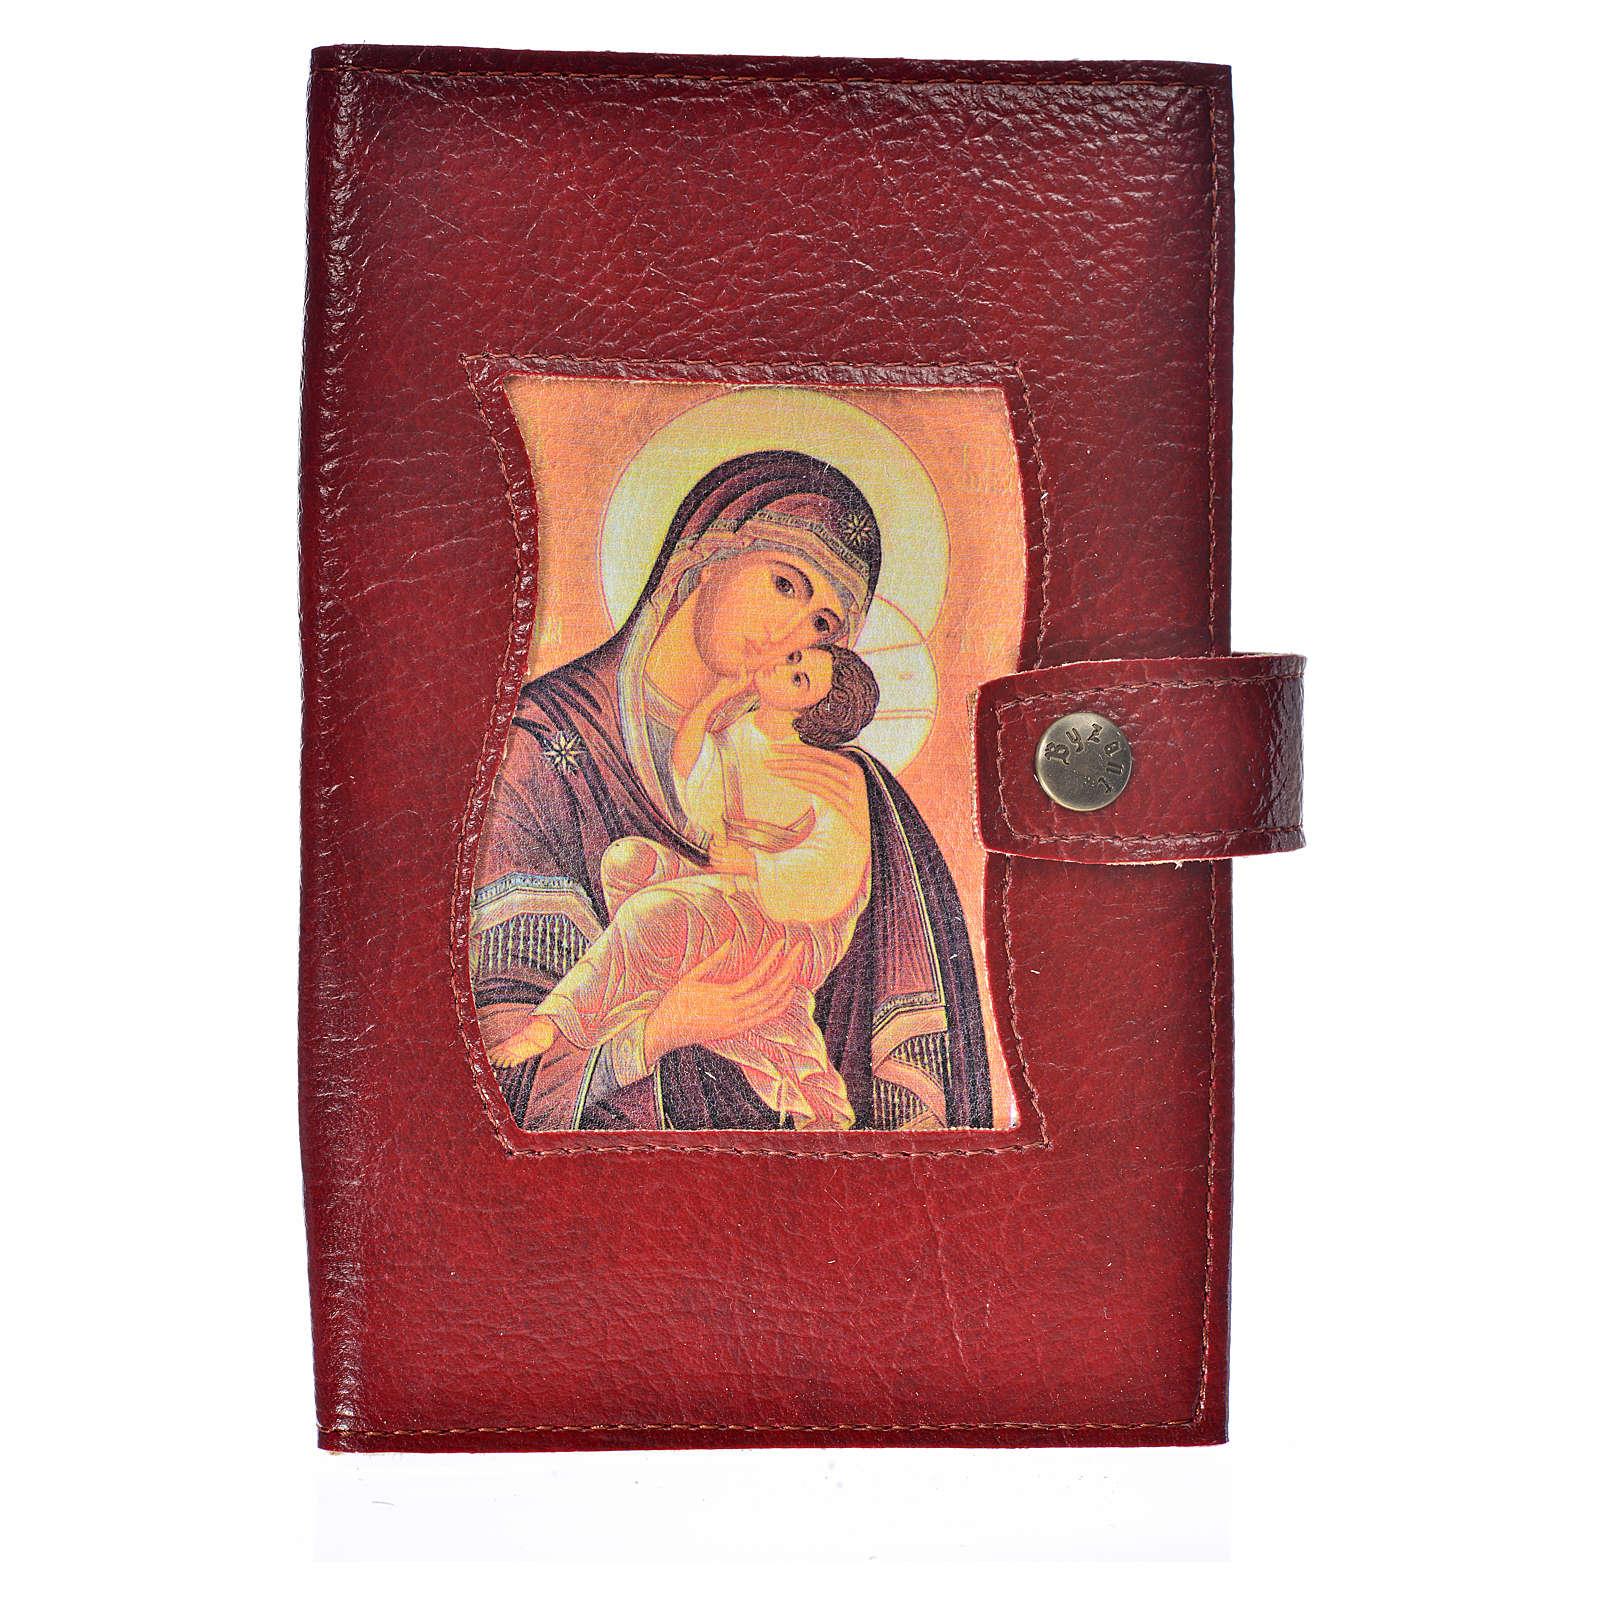 Funda Sagrada Biblia CEE ED. Pop. simil cuero V. Ternura burdeos 4